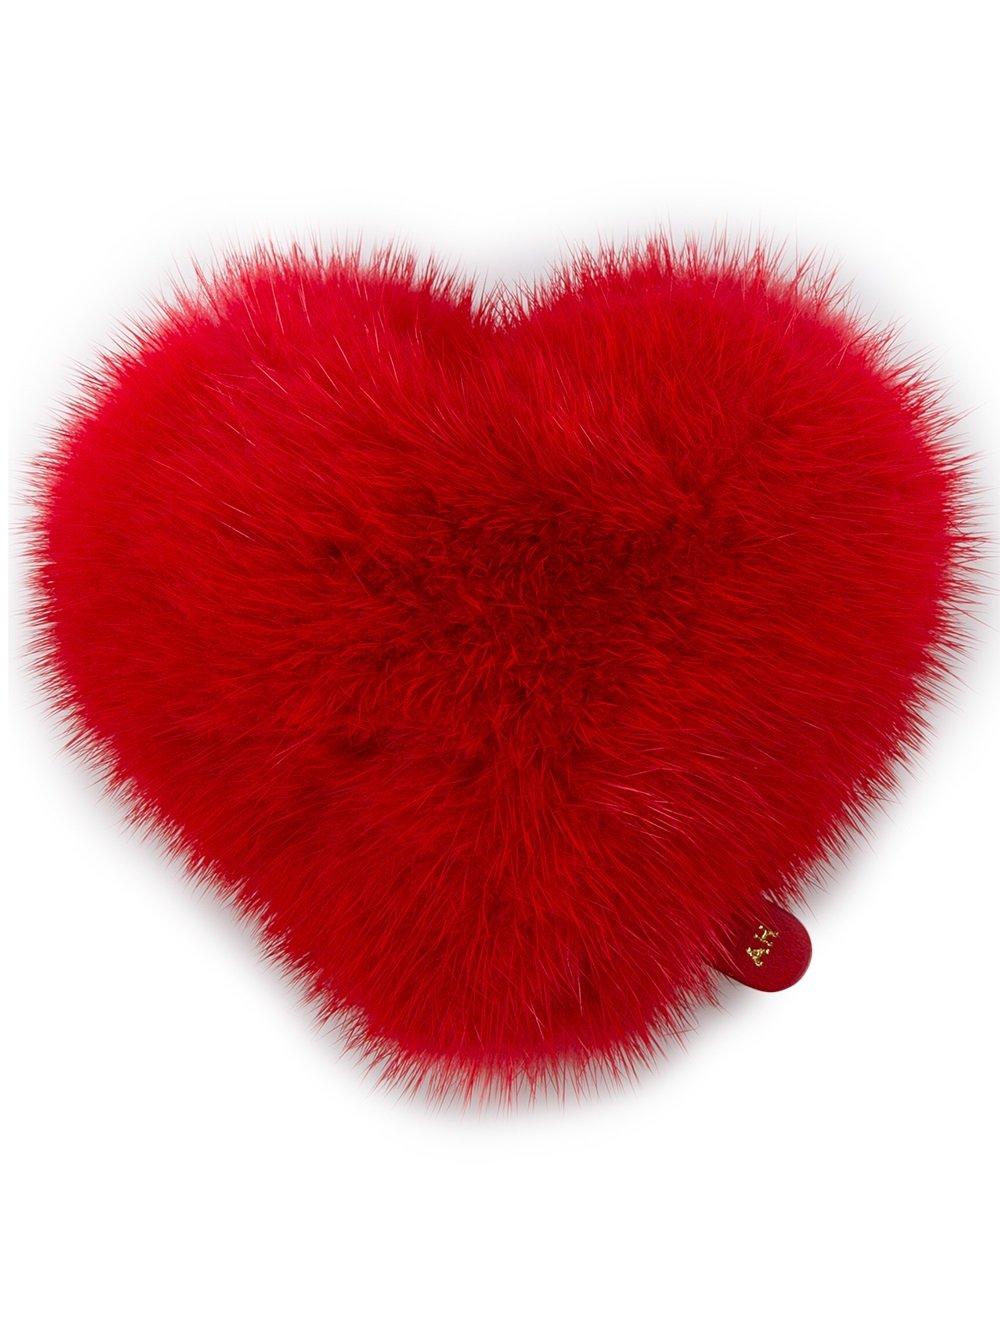 Anya Hindmach STIKERS HEART